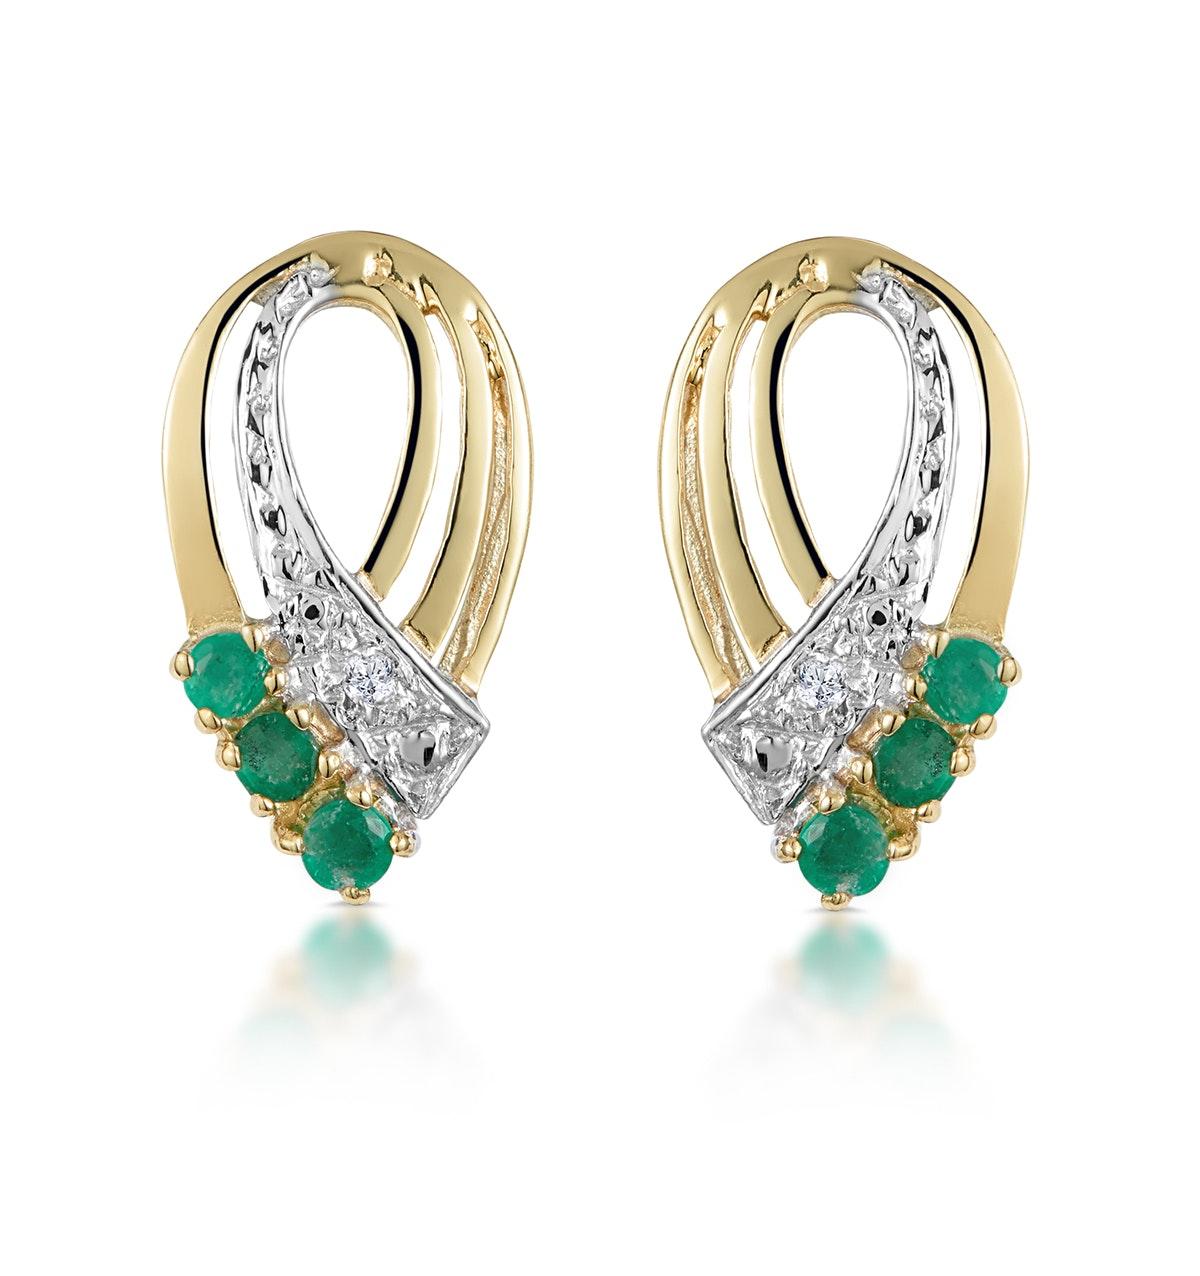 Emerald 8 x 15mm And Diamond 9K Yellow Gold Earrings